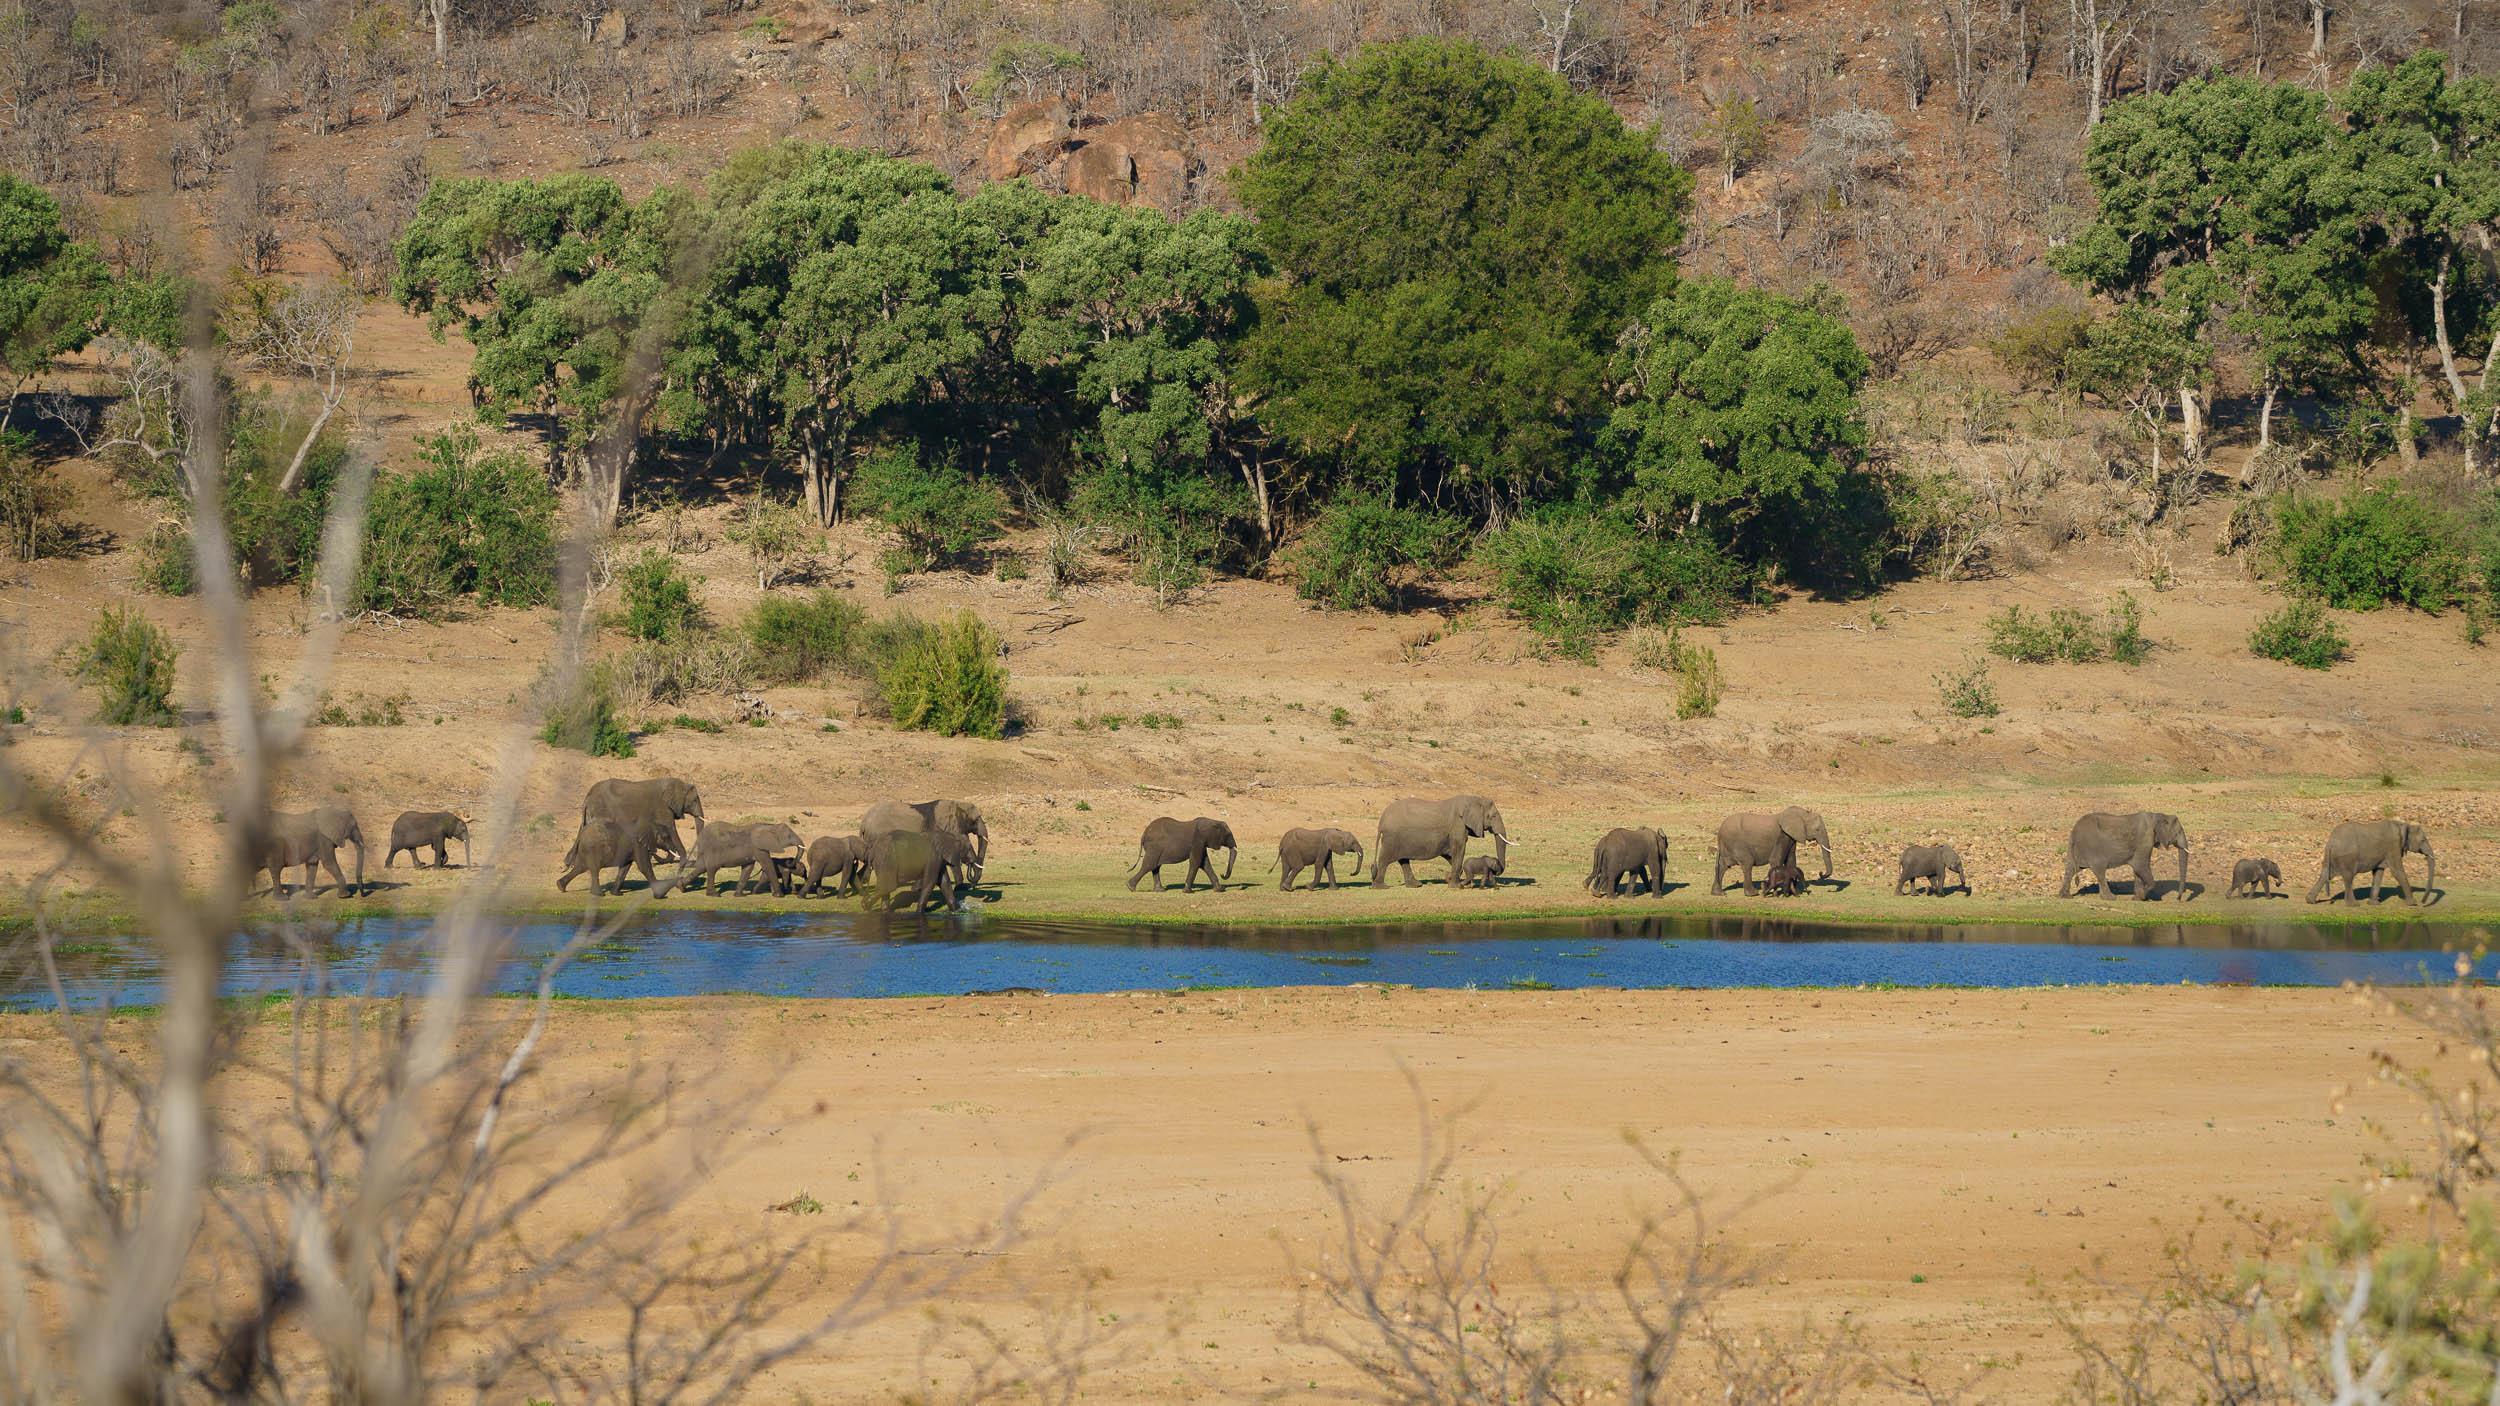 Elephant family along the Letaba river